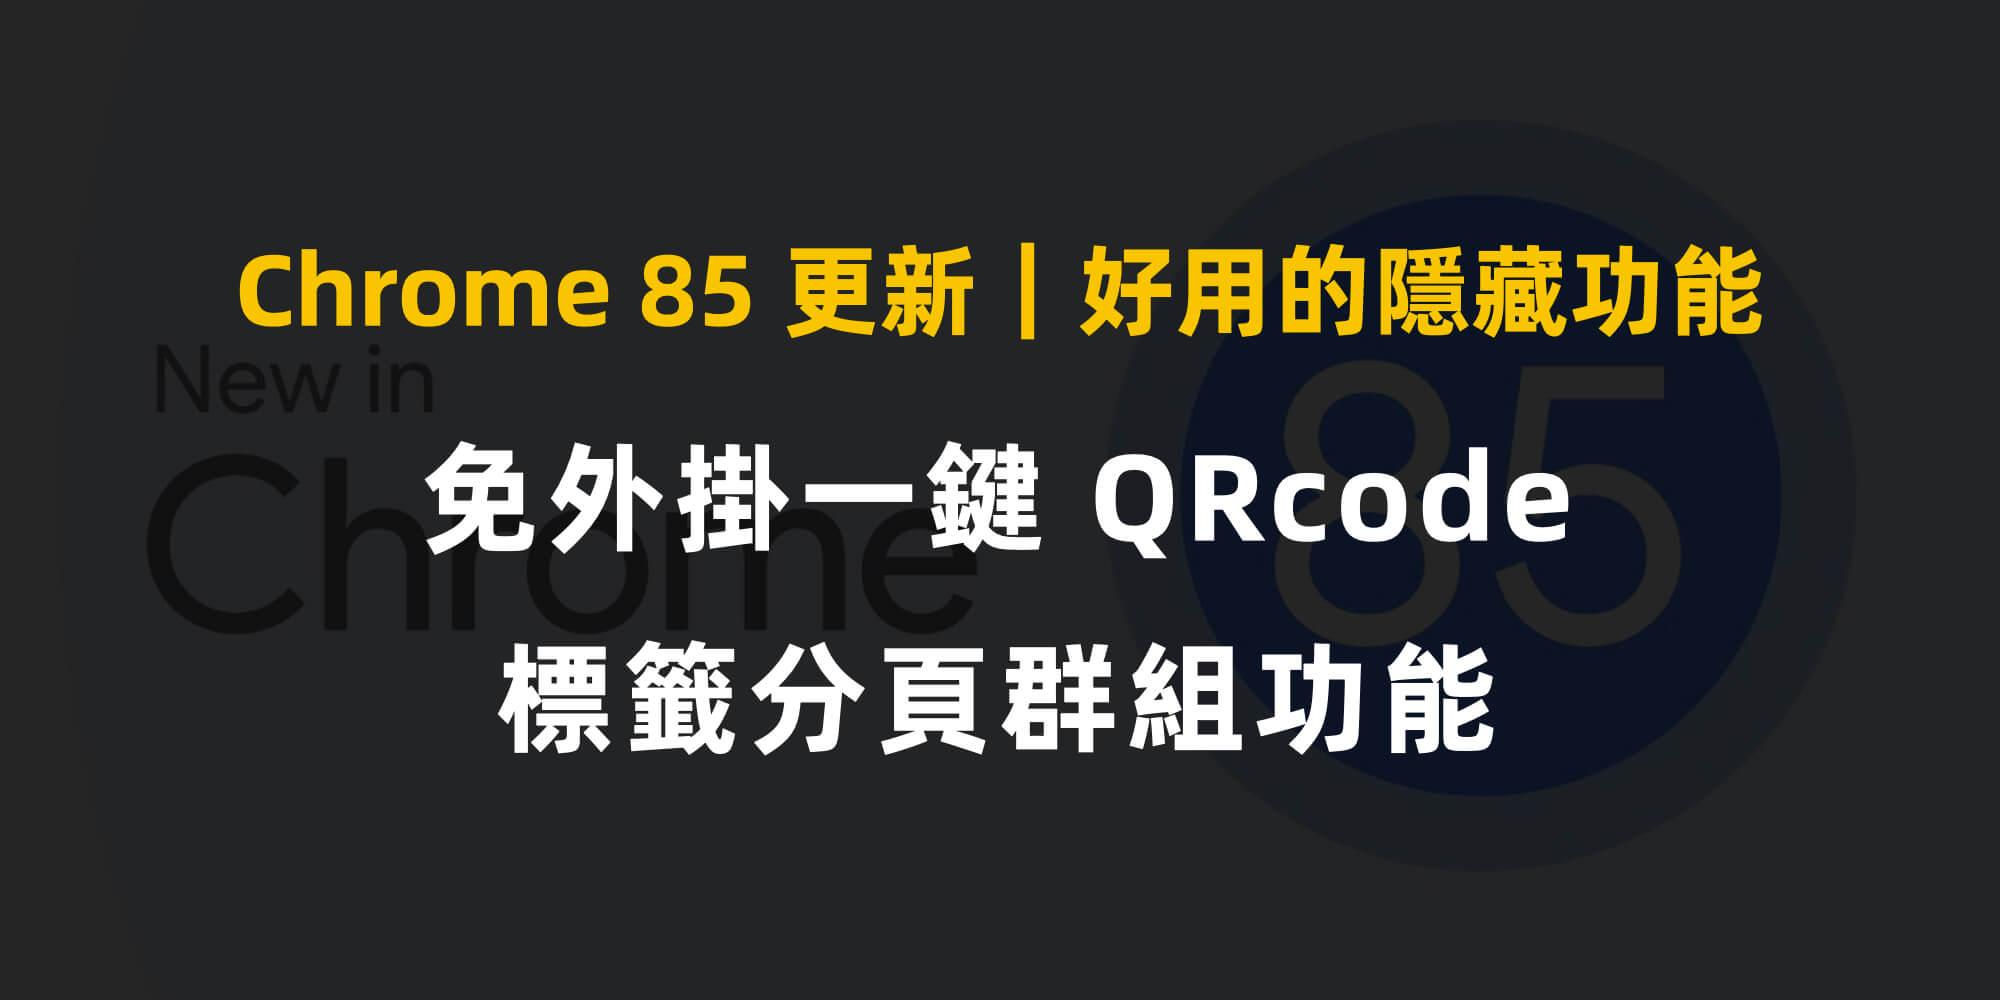 Chrome-85-更新|好用的隱藏功能-QRcode-產生製作